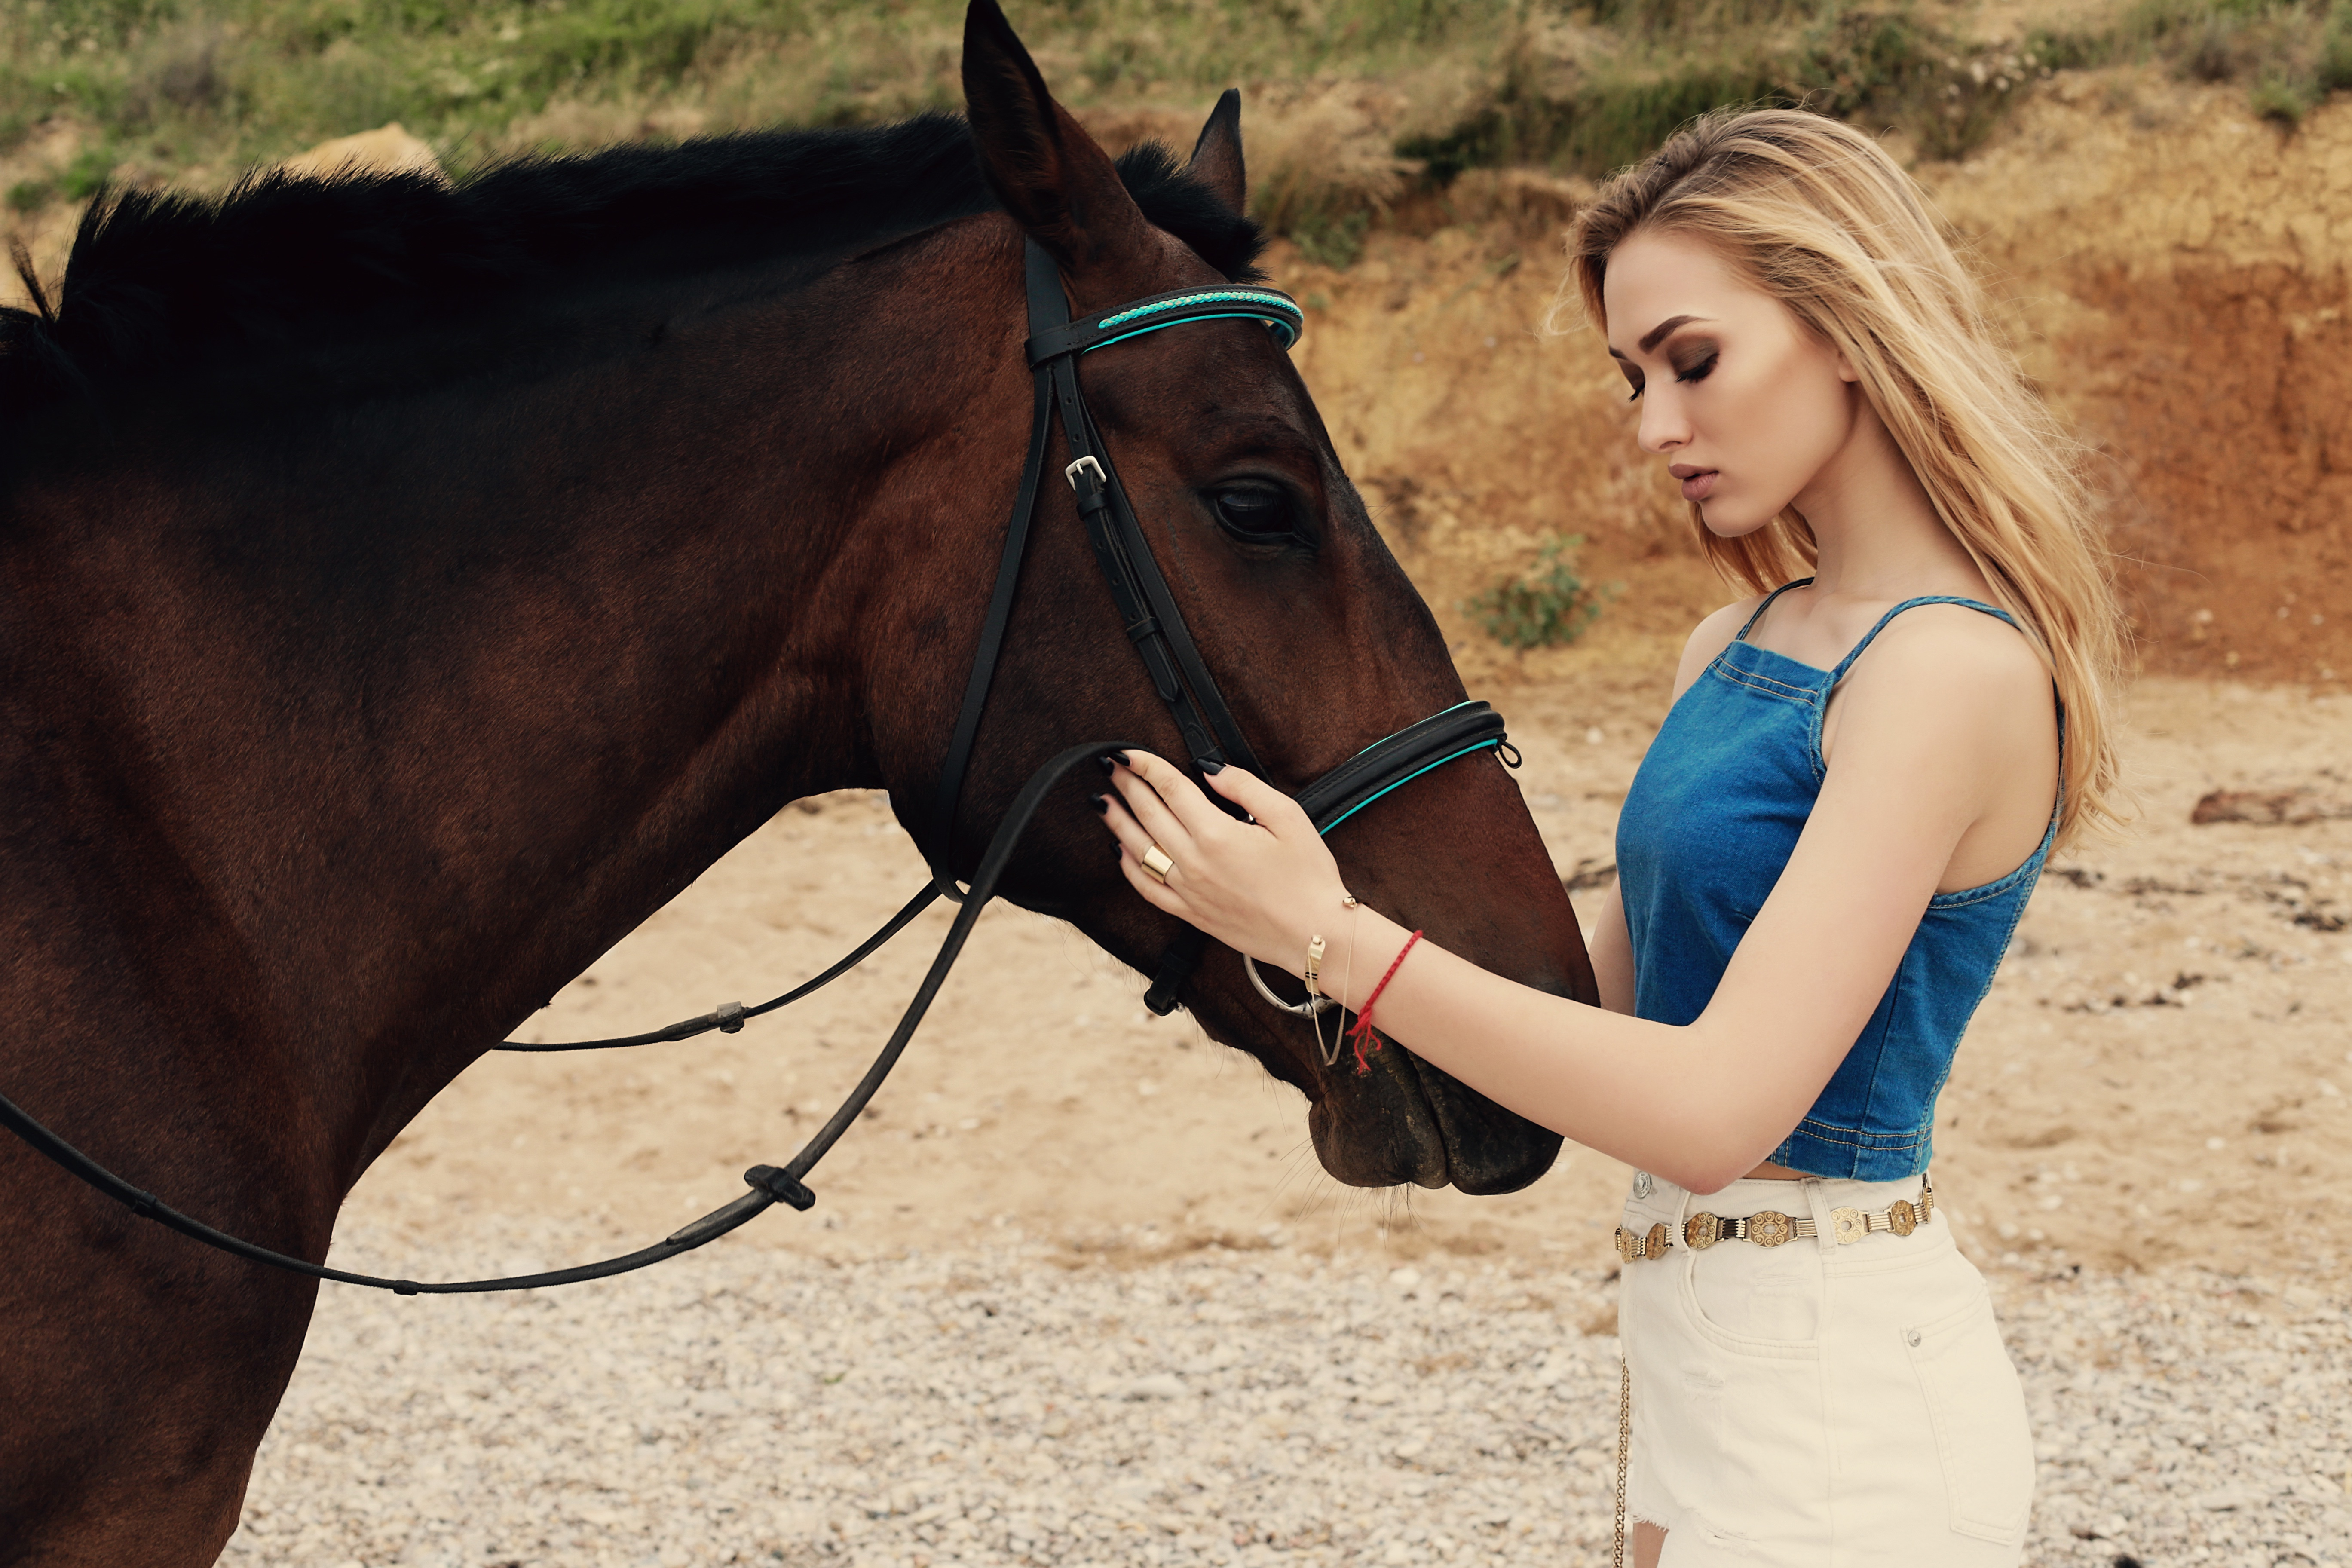 blonde girl with horse 1575665095 - Blonde Girl With Horse -